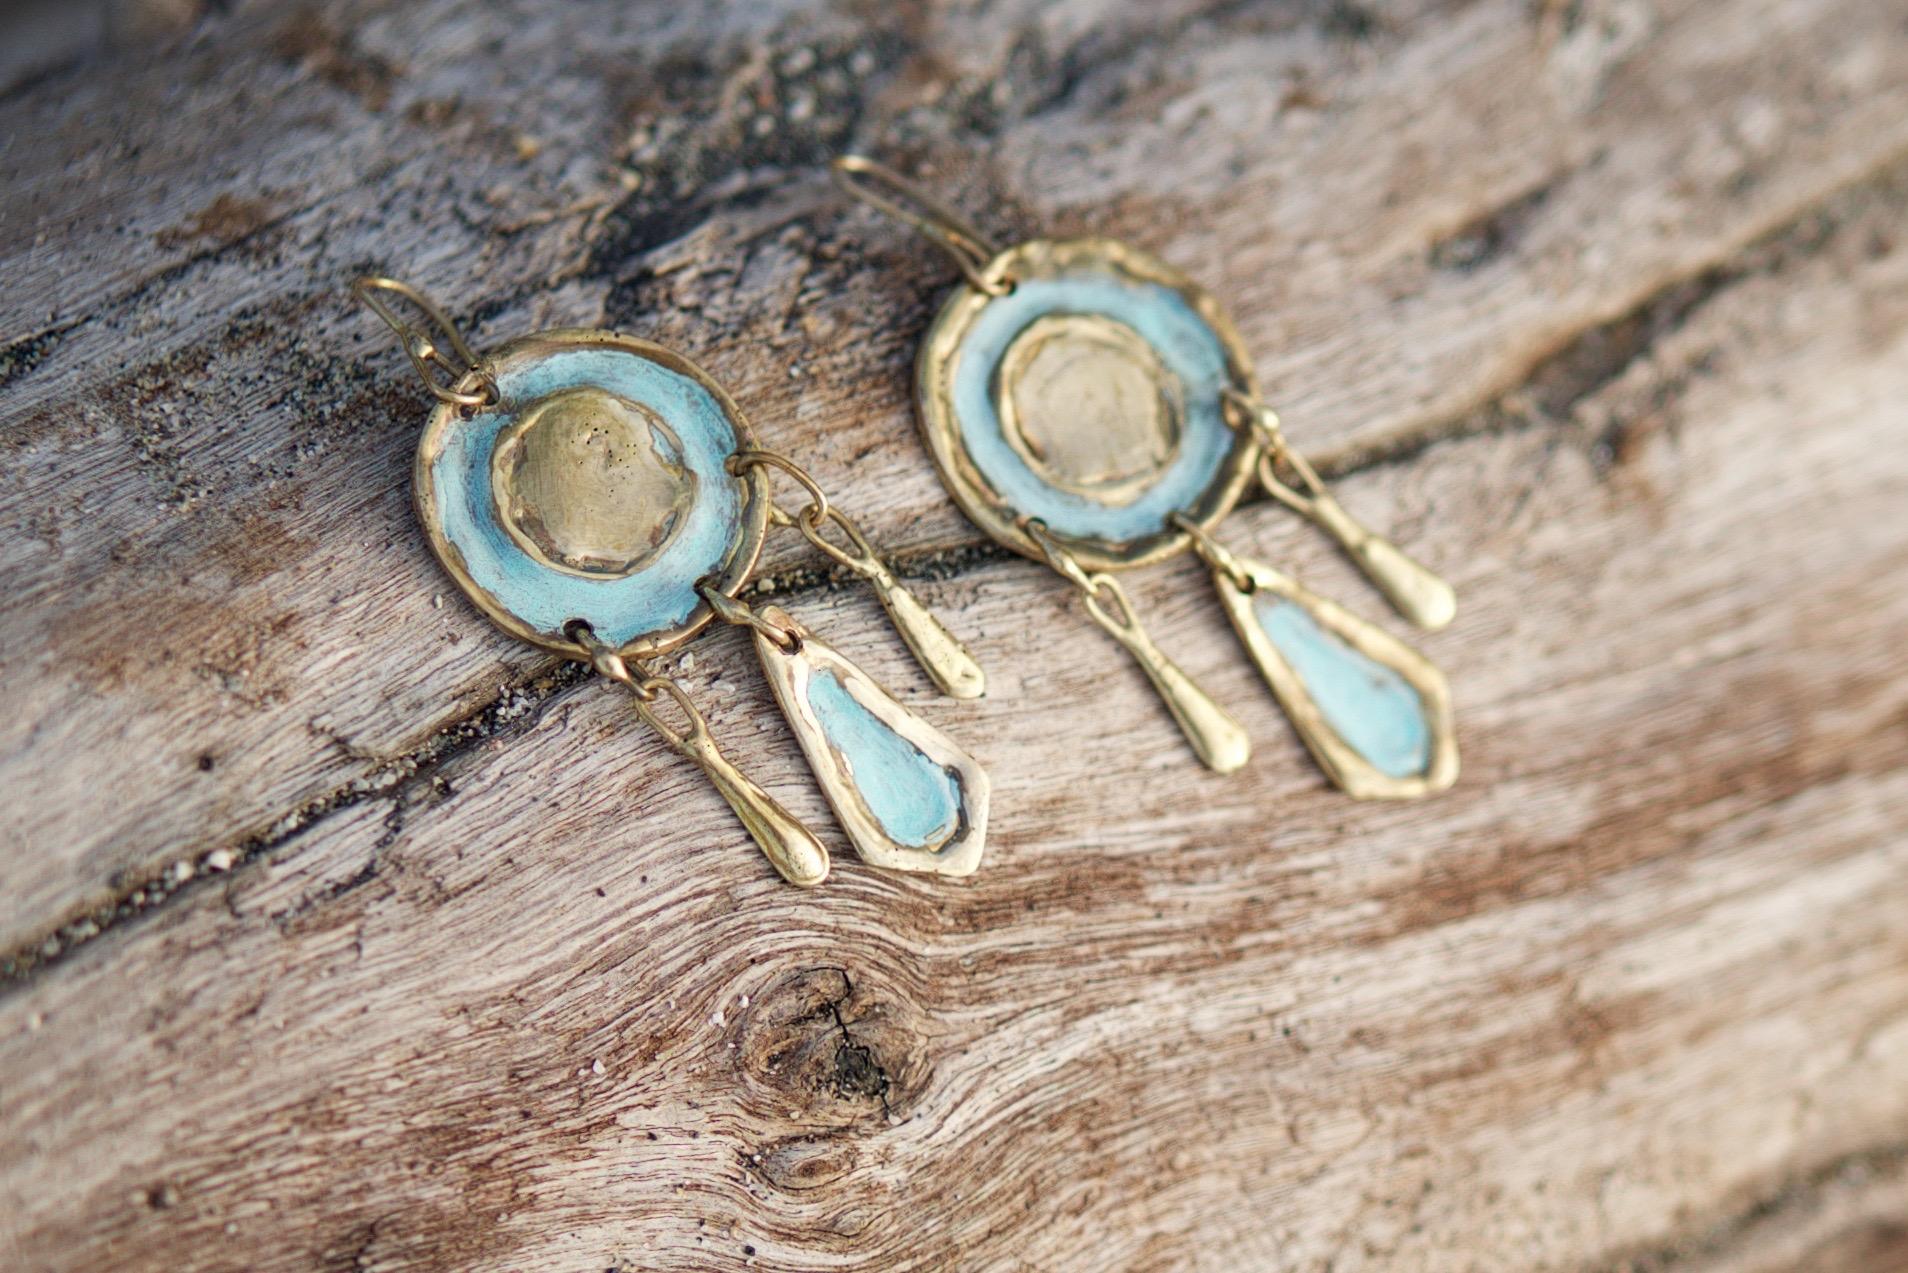 Tonatiuh Earrings (Mexican Handmade Bronze Jewelry)